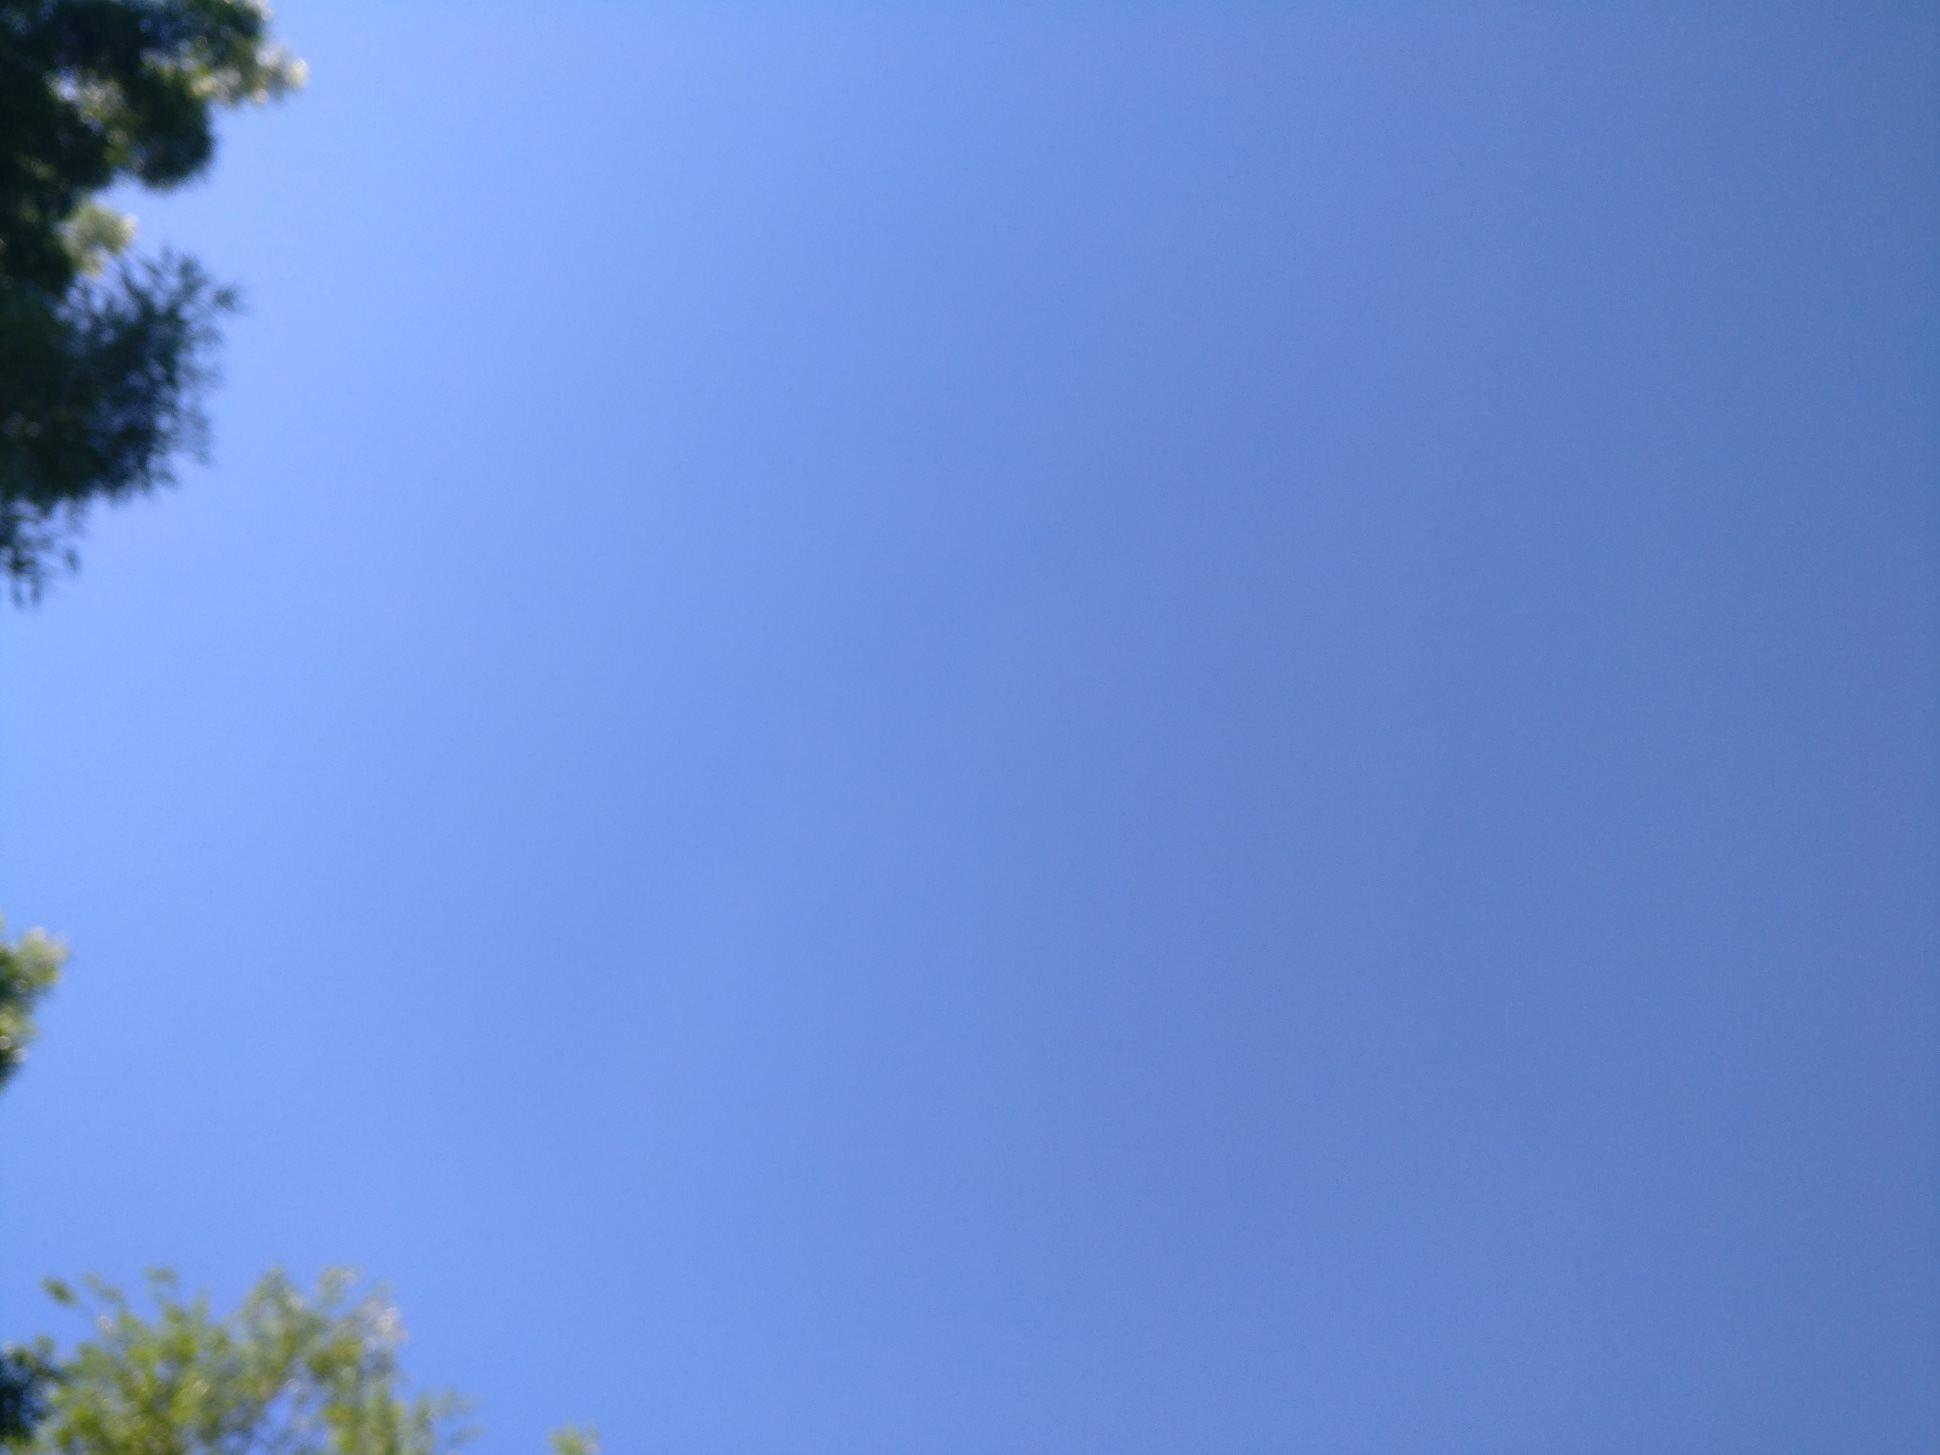 A beautiful summer sky